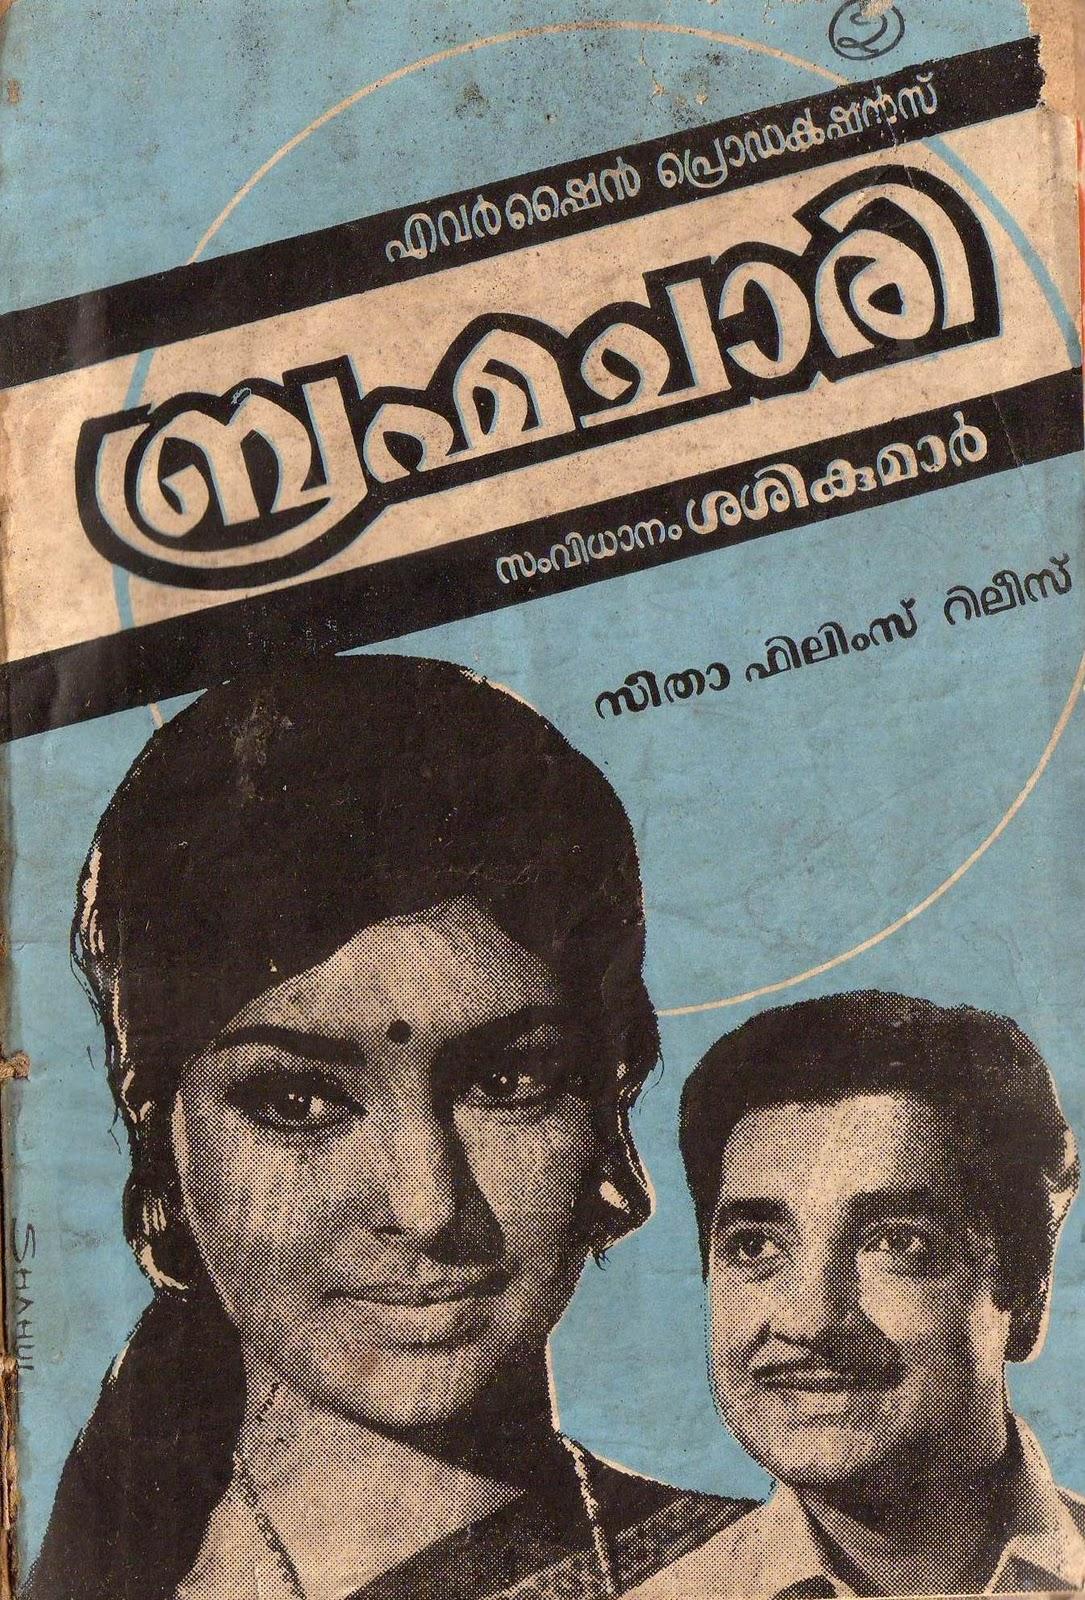 Bhadradeepam malayalam movie / Vijay 1988 movie online